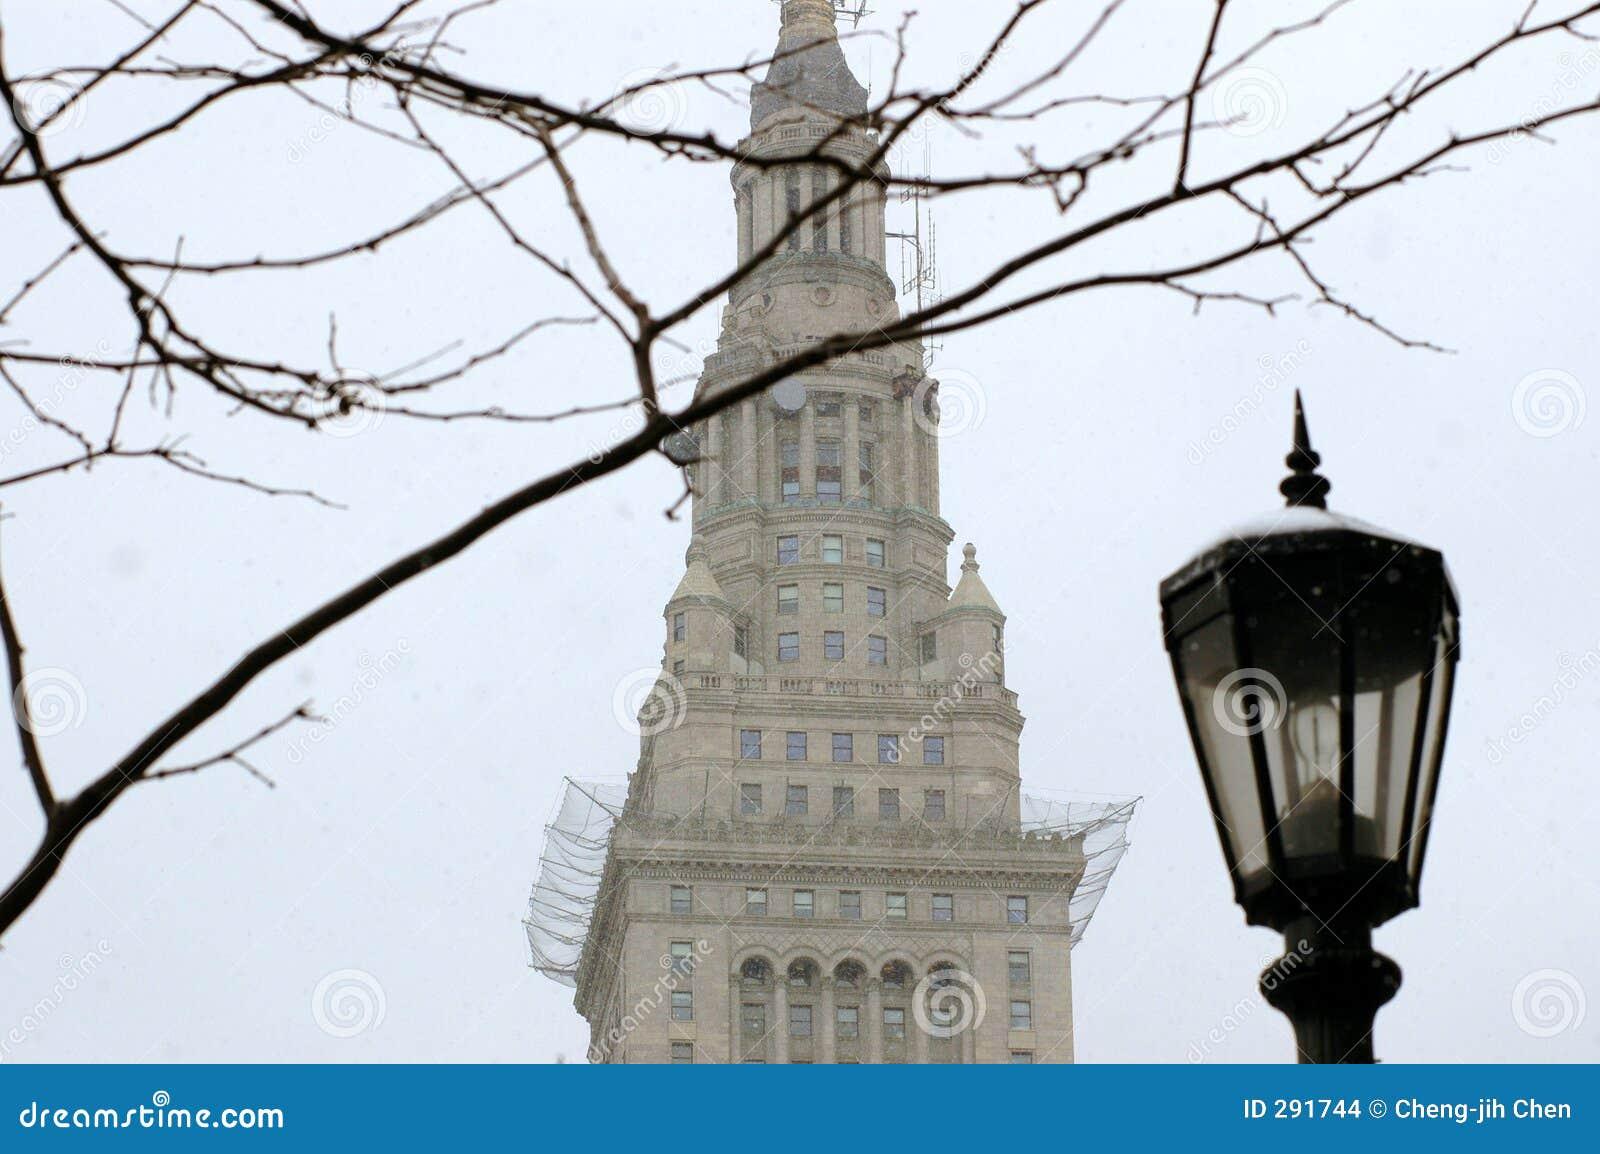 Eind Toren in Cleveland tijdens de Winter